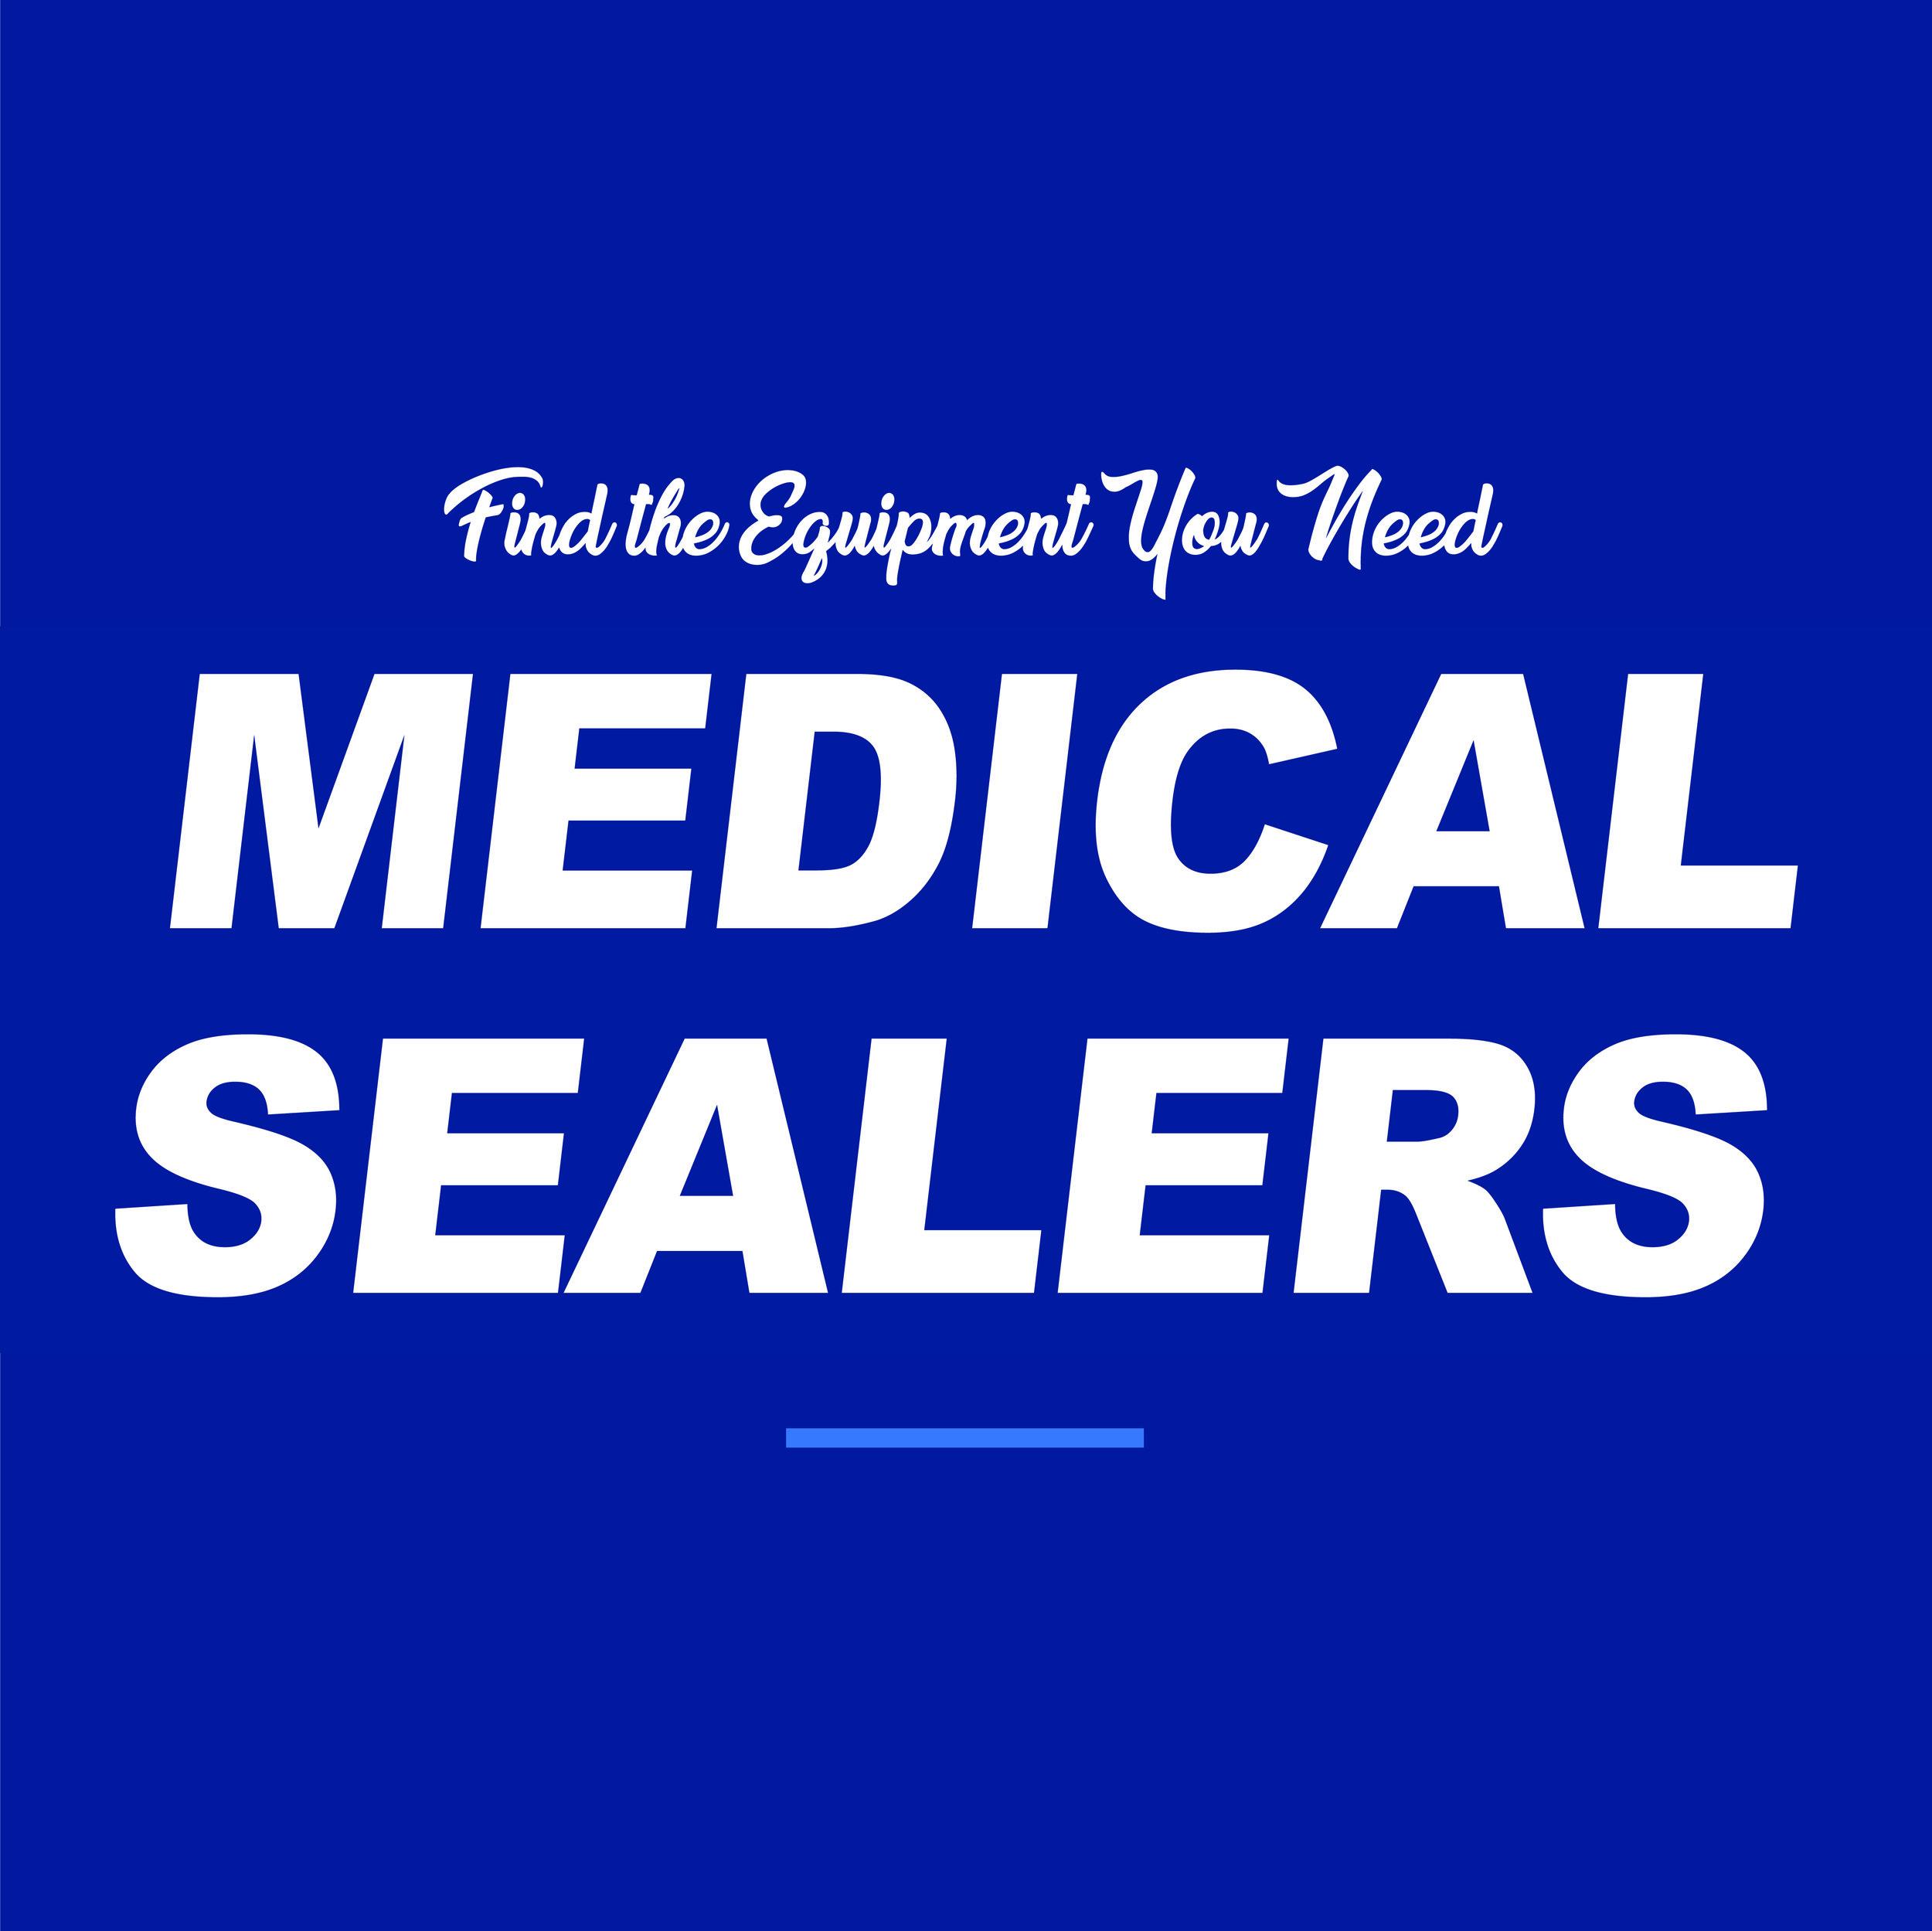 Blog-Header_Medical Sealers.jpg